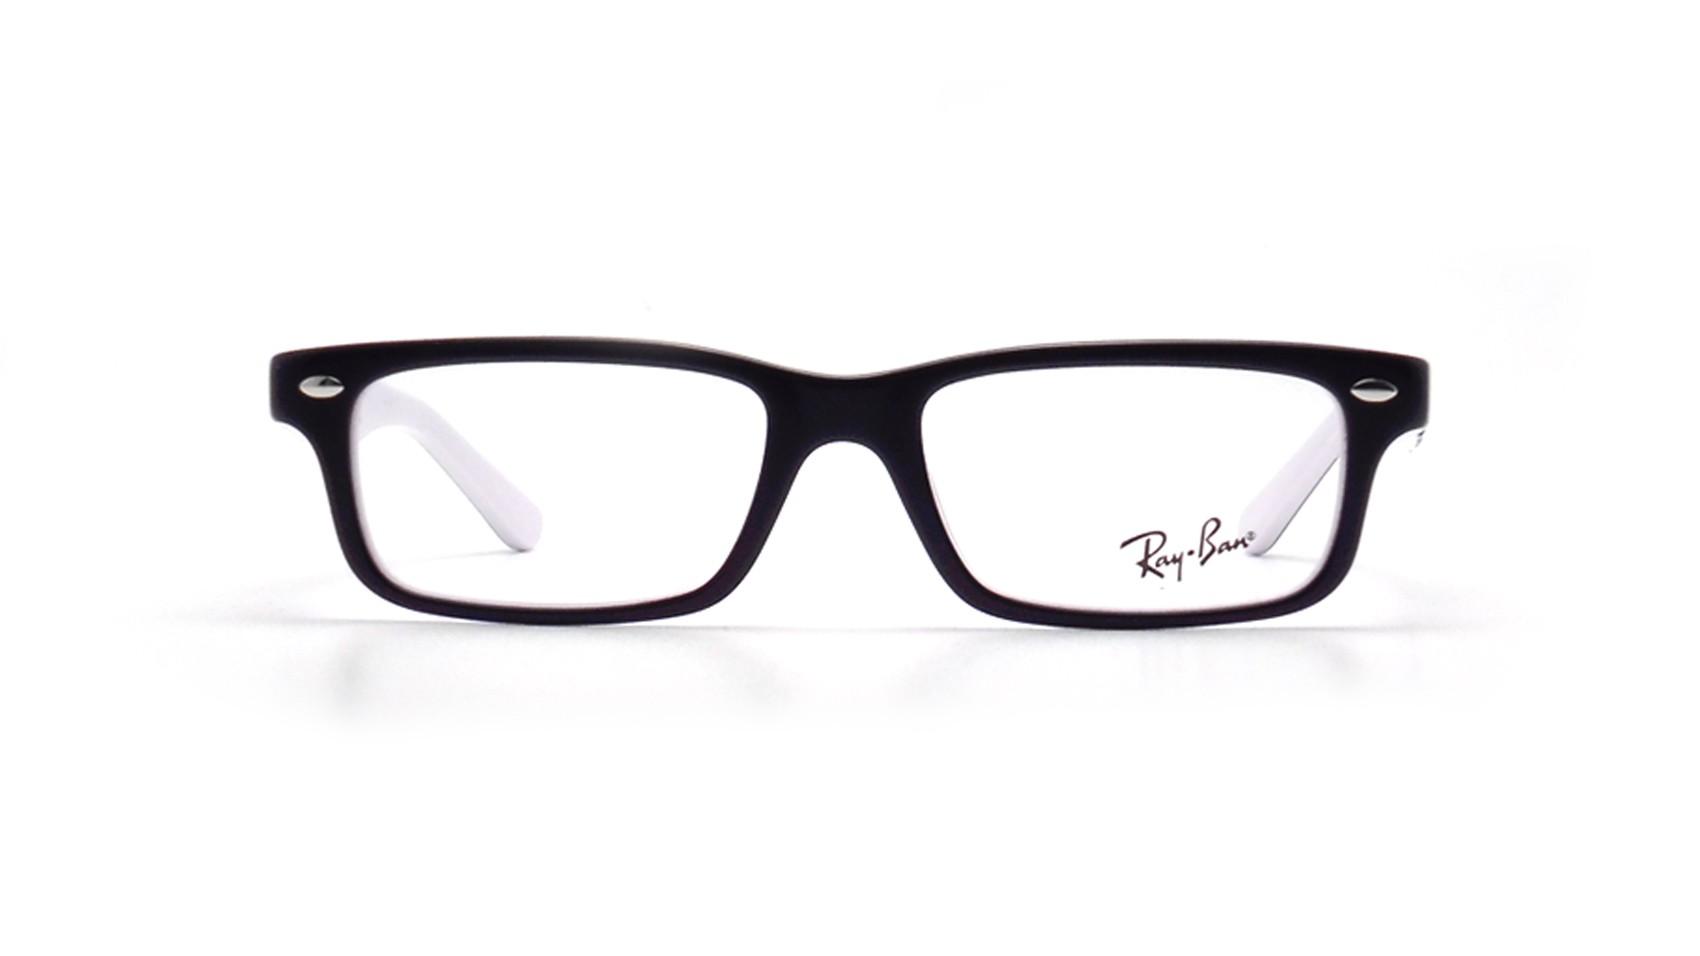 1d5cf28d9ae Eyeglasses Ray-Ban RYRB1535 3579 48-16 Black Junior